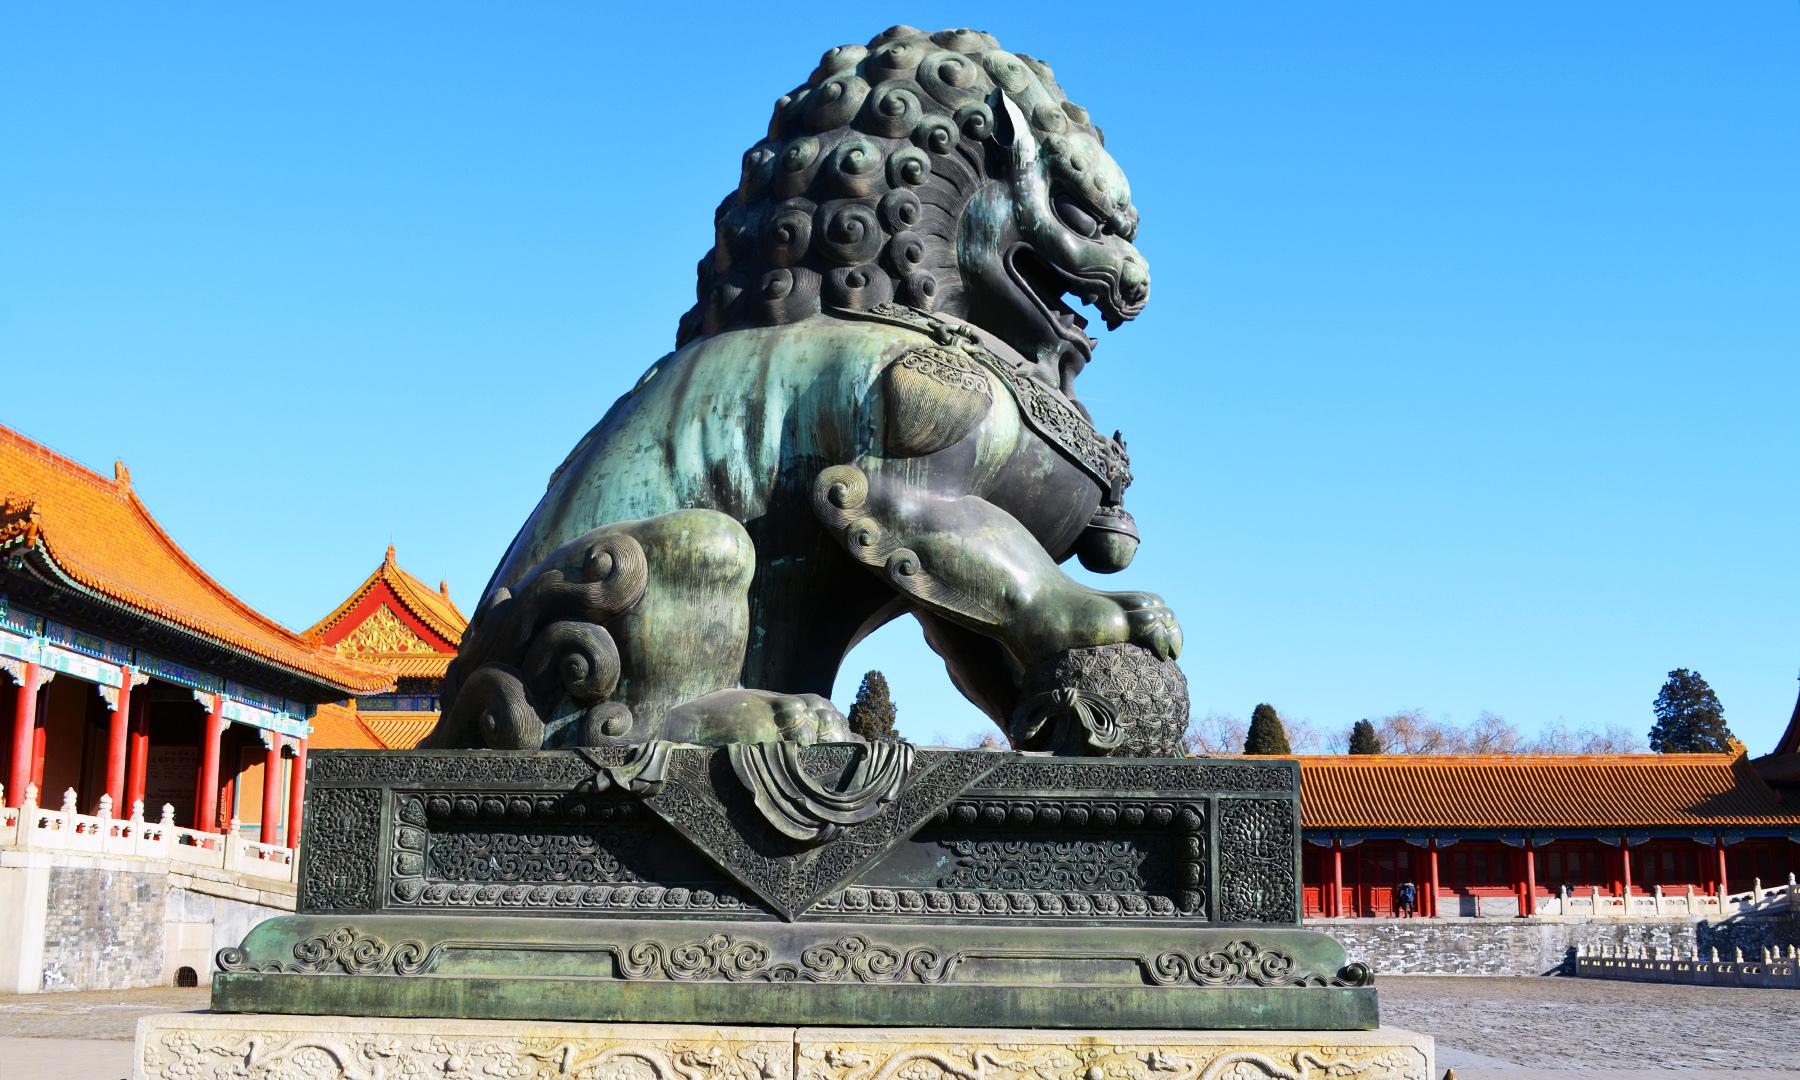 شہر ممنوعہ، چین میں موجود ایک قدیم مجسمہ — تصویر رمضان رفیق